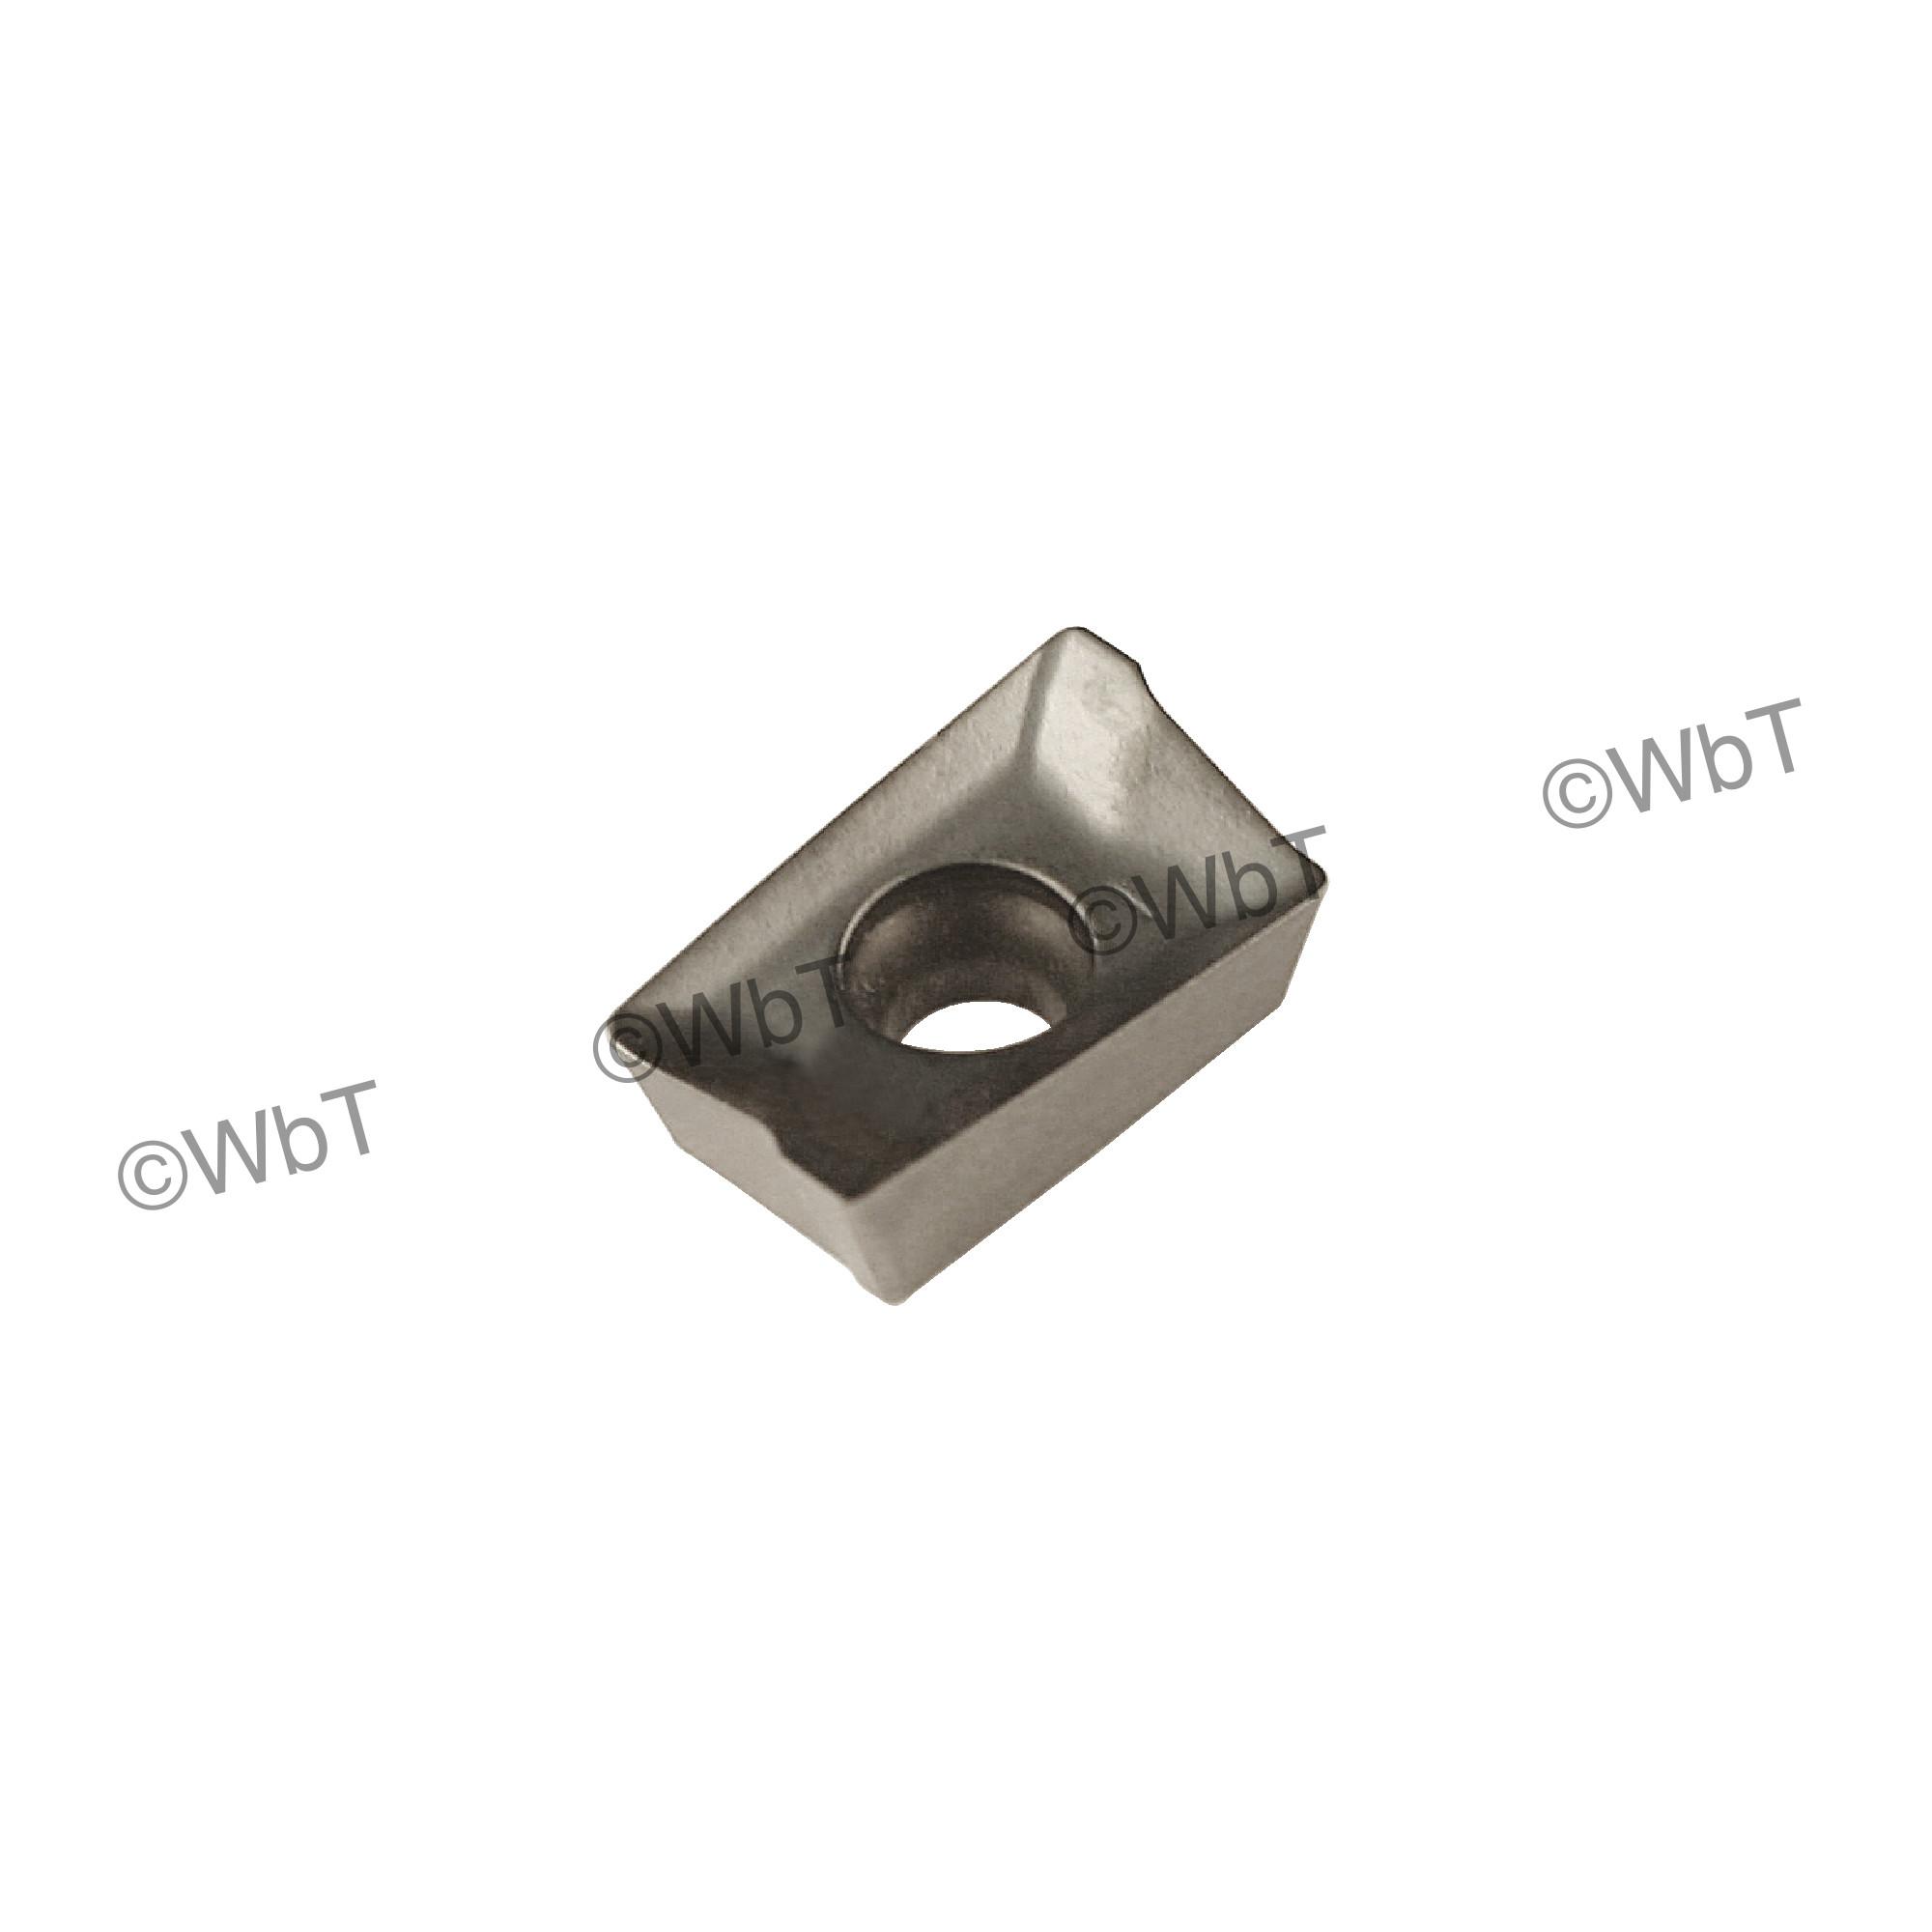 ISCAR - APKR1003PDR-HM IC328 Parallelogram / INDEXABLE Carbide MILLING INSERT